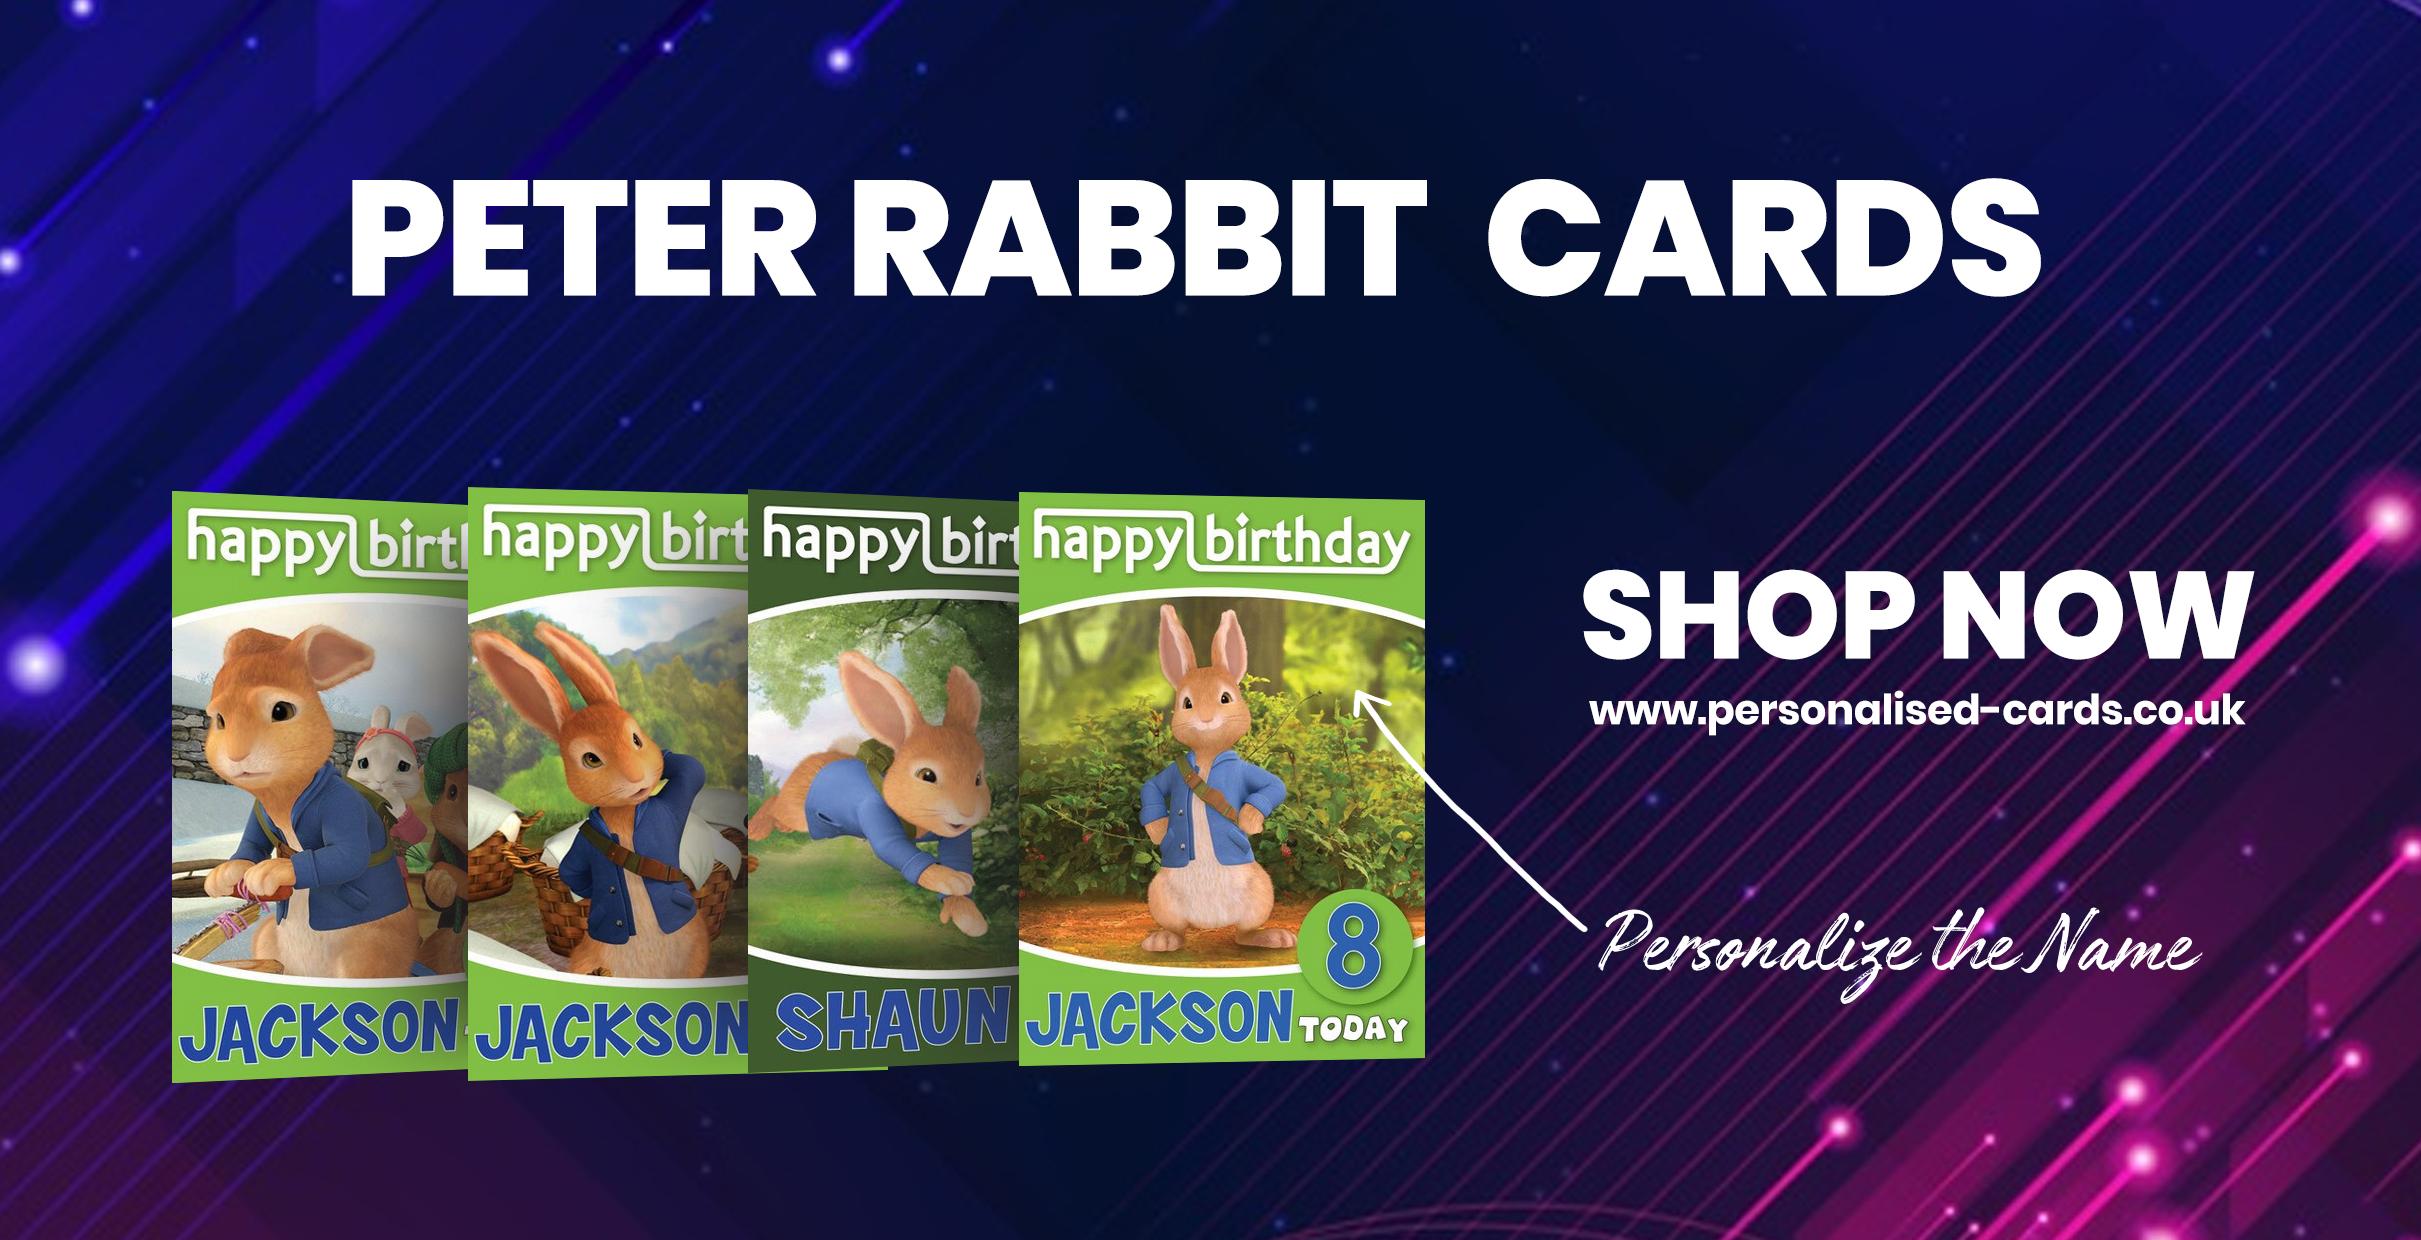 peter-rabbit-cards.jpg